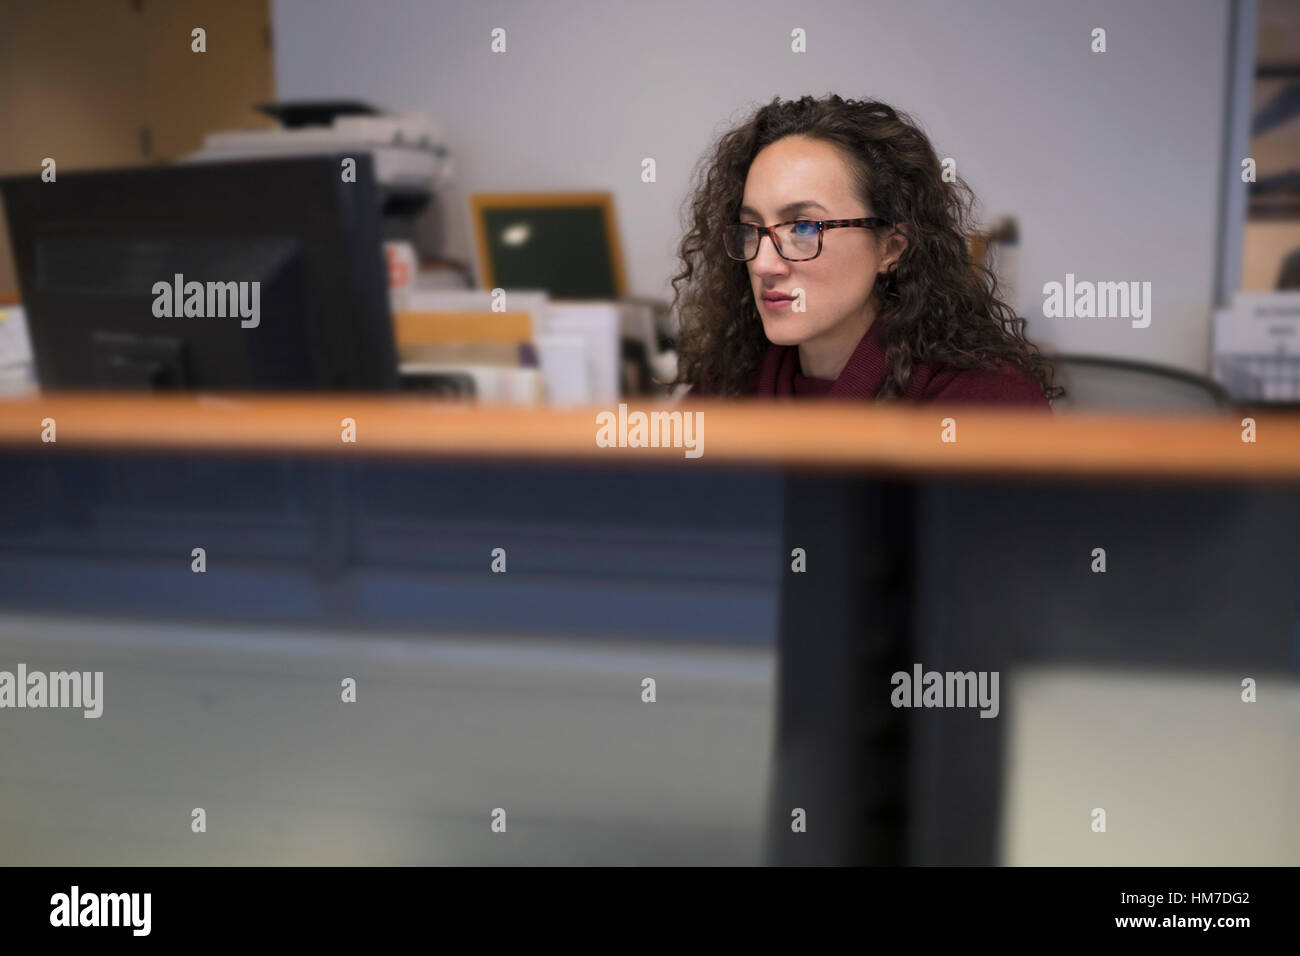 Young woman looking at computer monitor - Stock Image